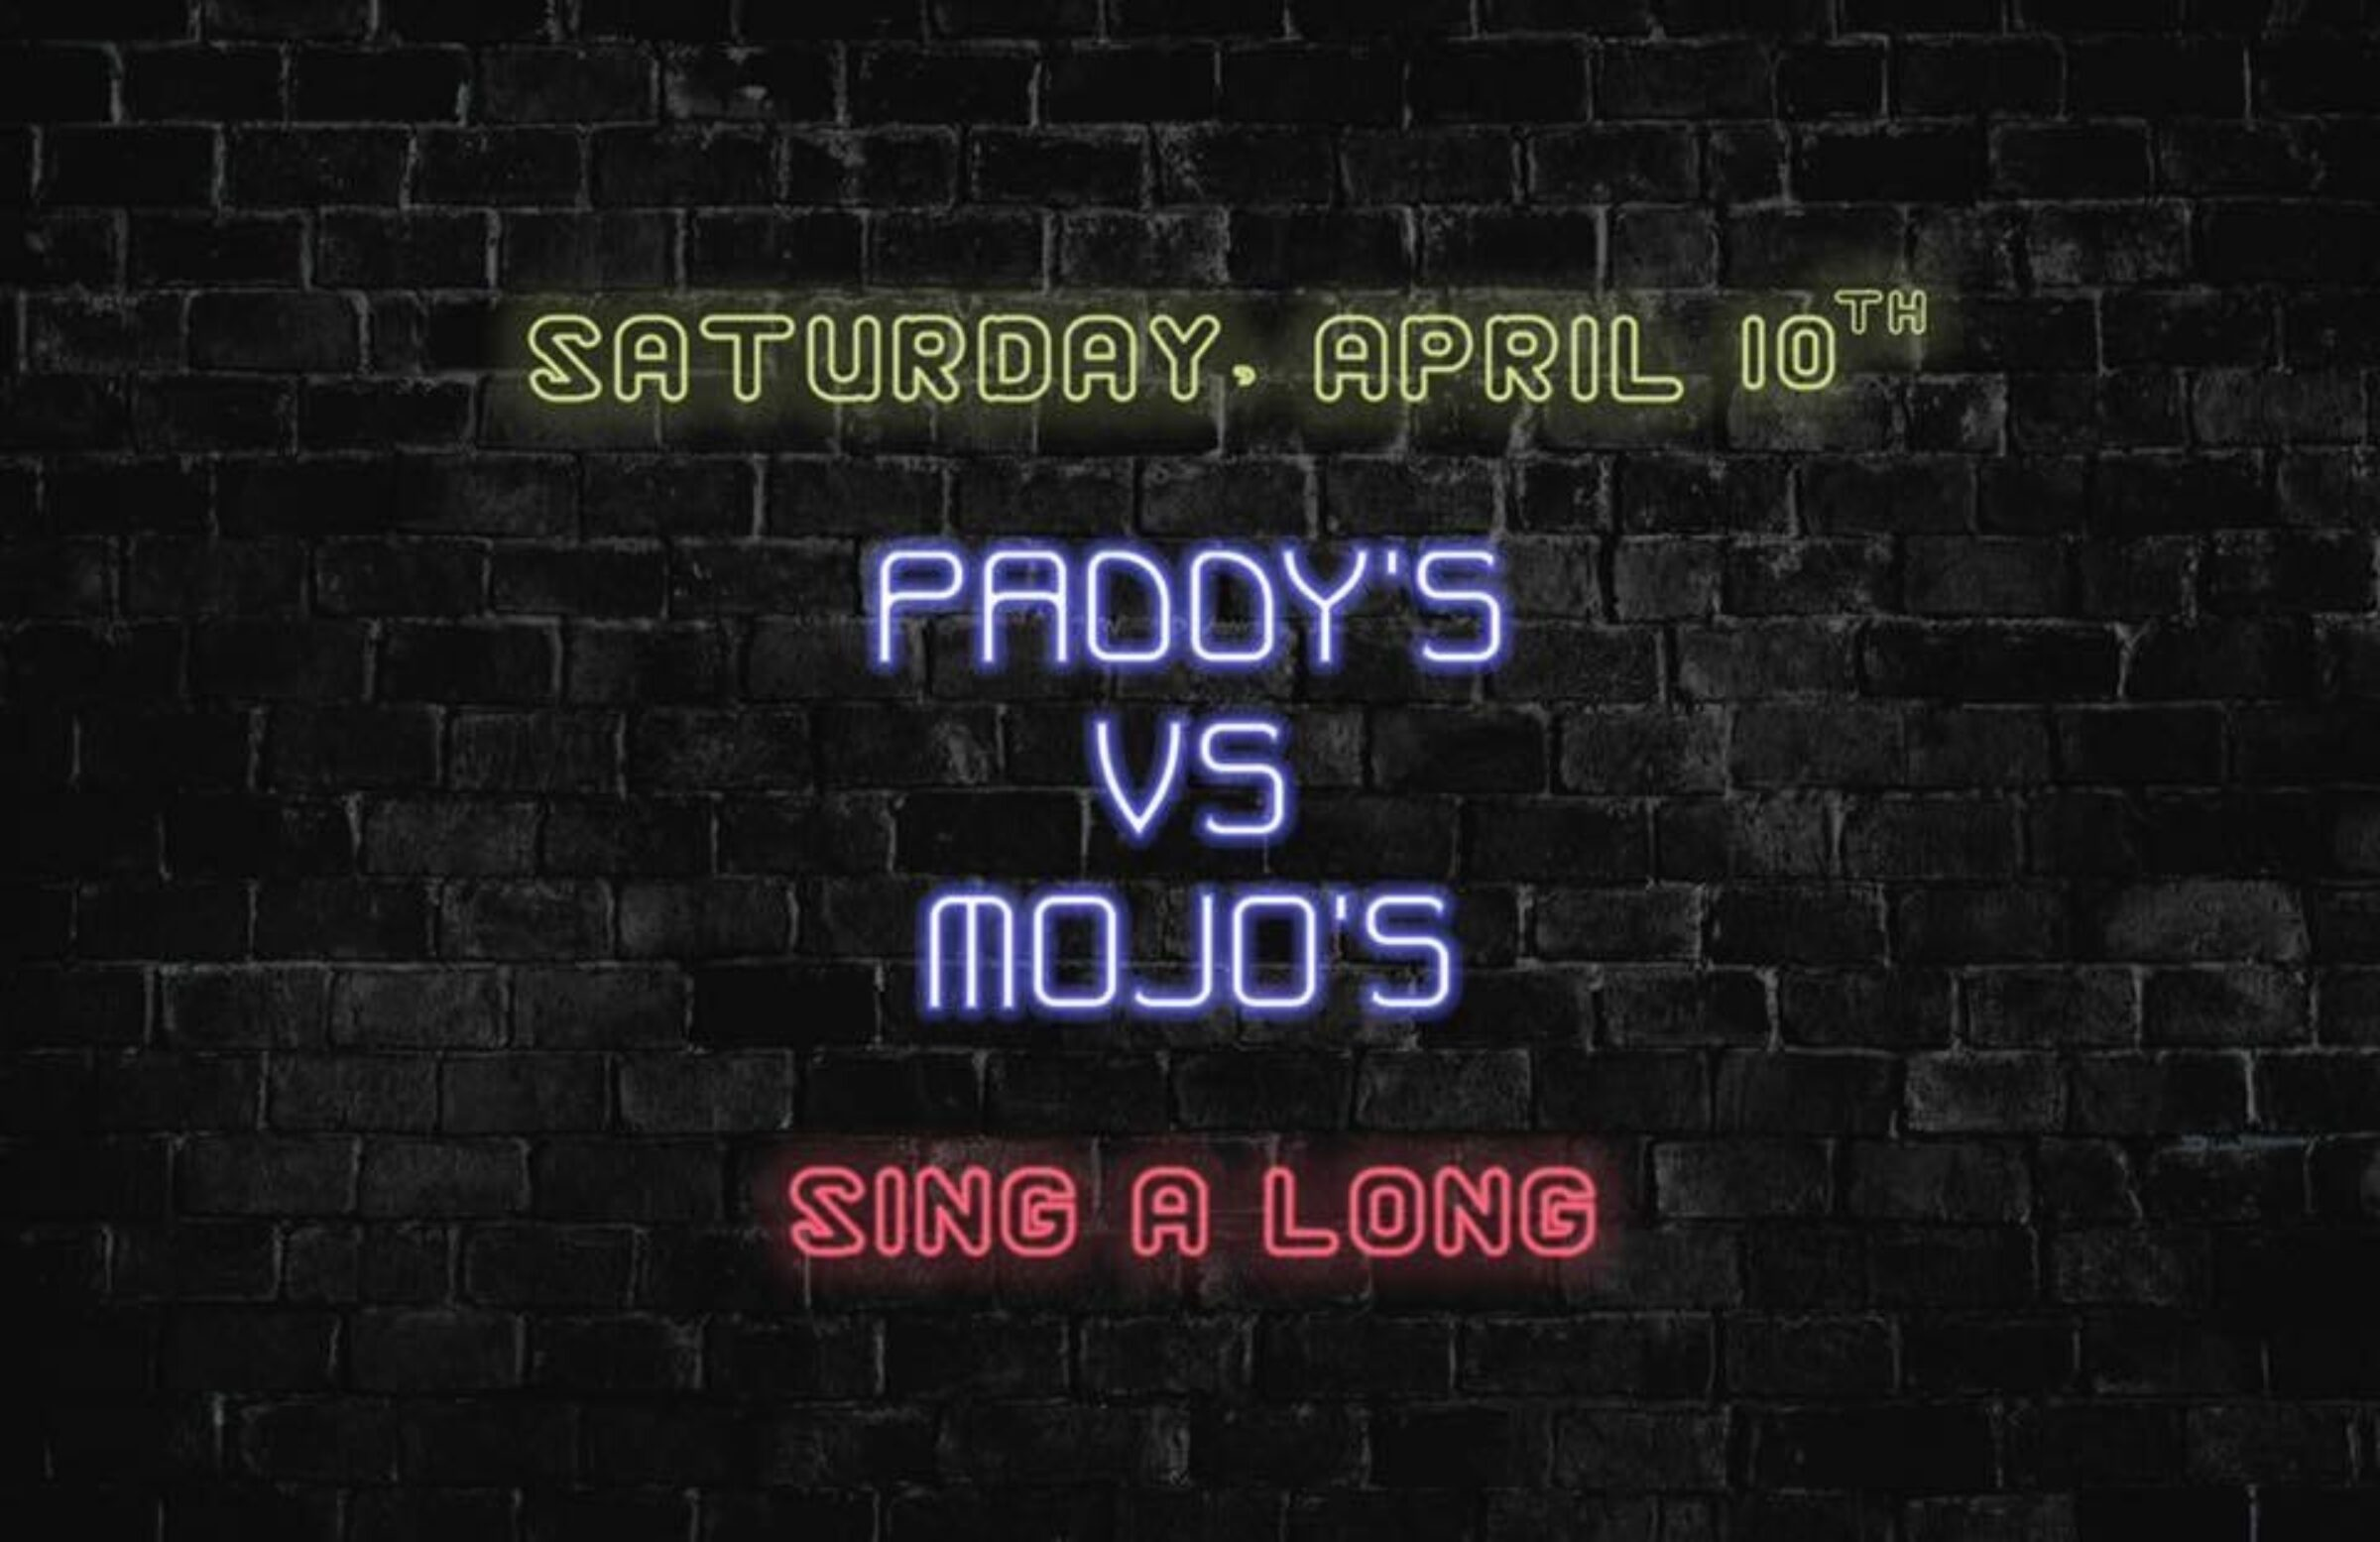 Paddys vs Mojos